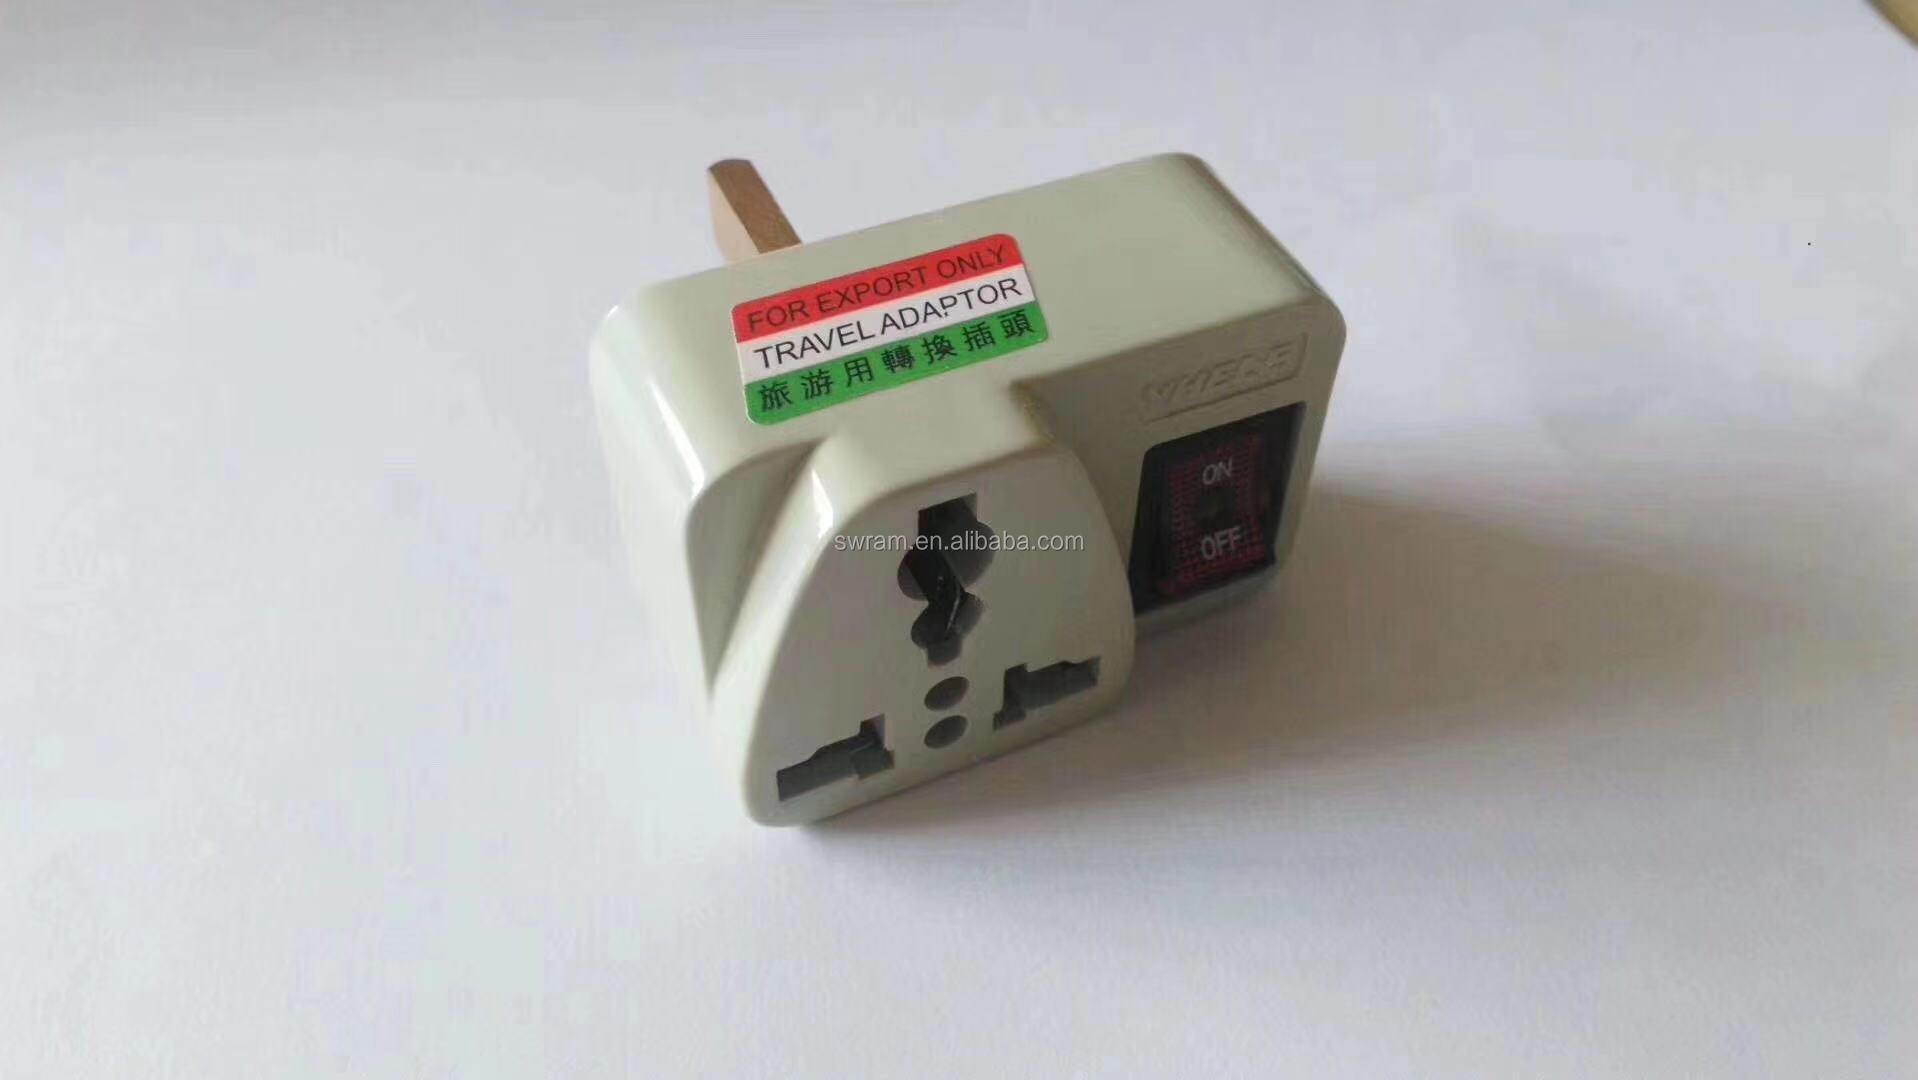 Travel Universal Adapter Electrical Plug For UK EU AU to EU European hot selling